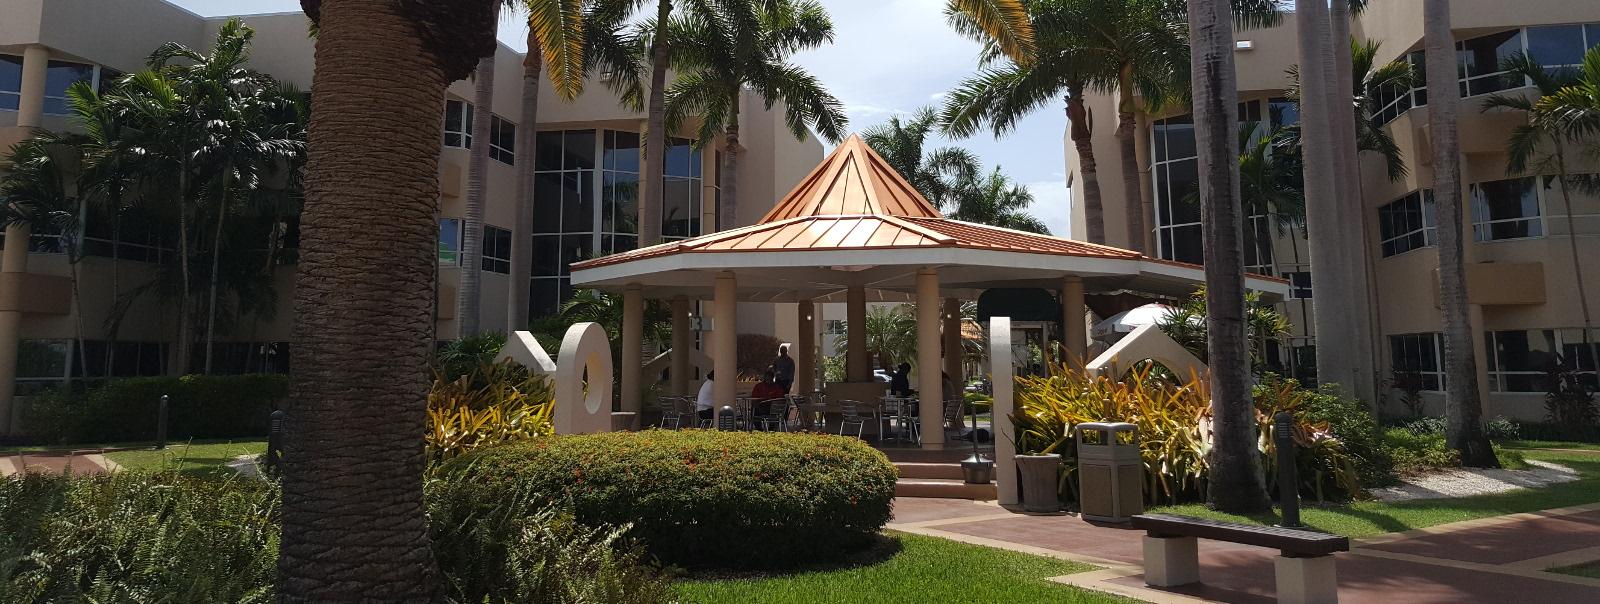 Matthew's University